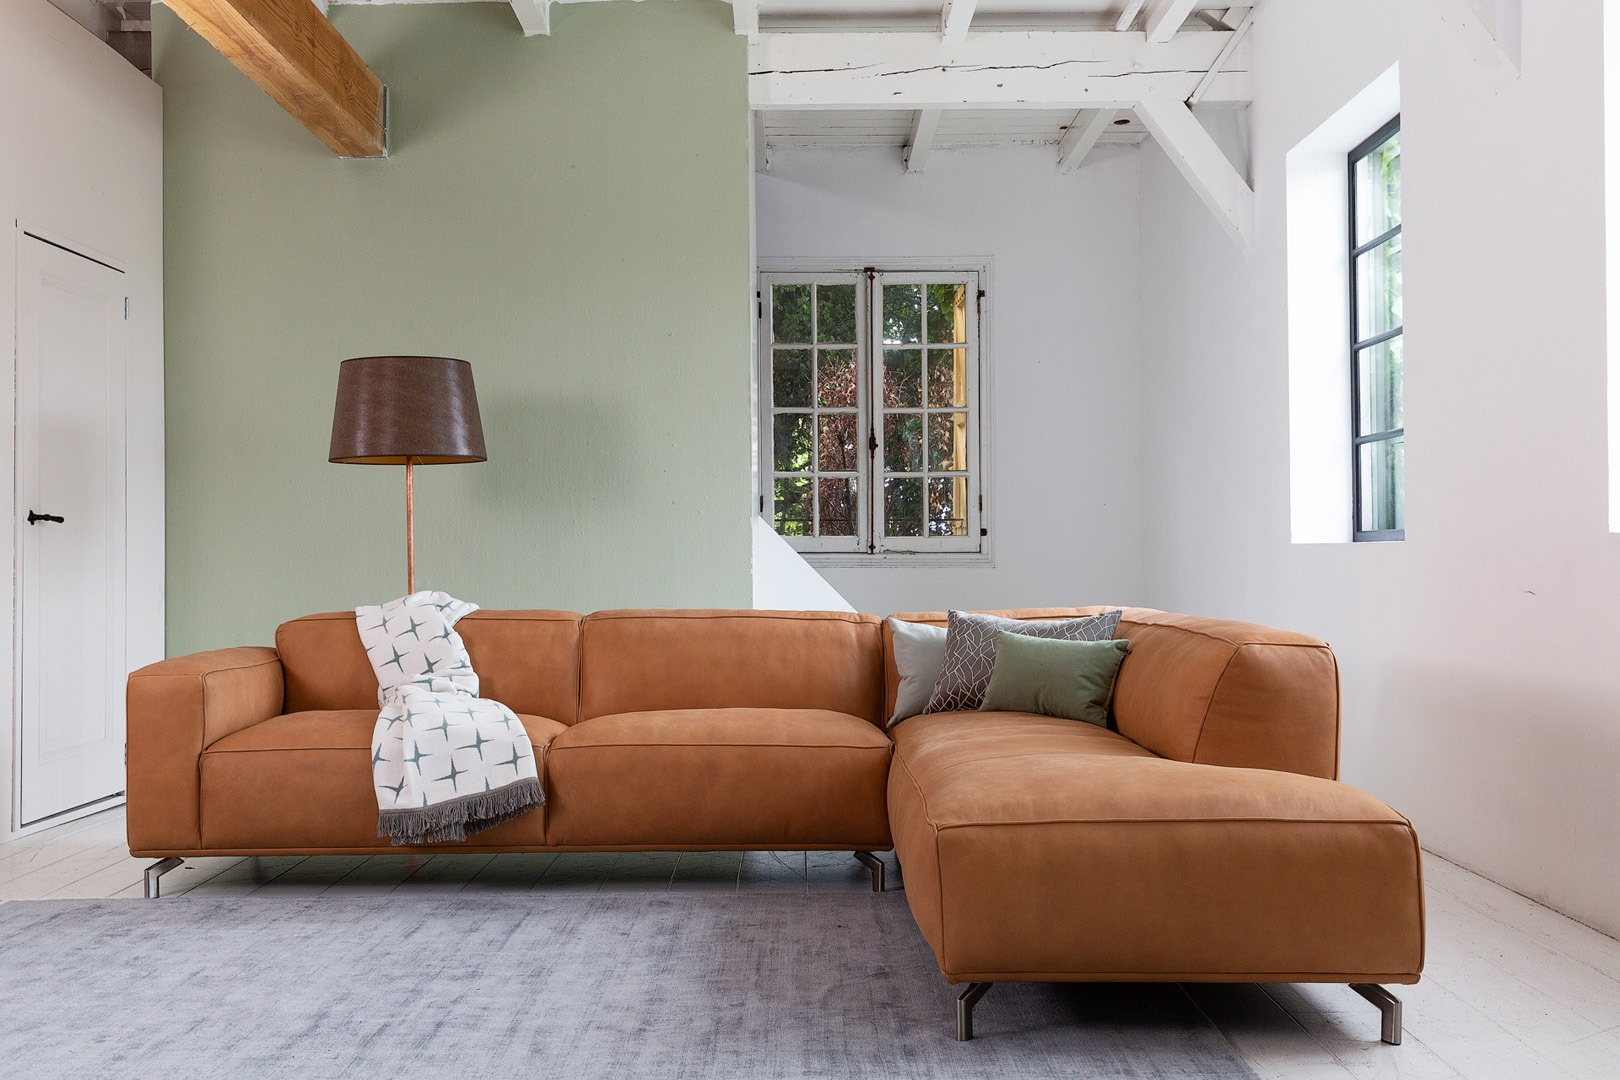 chill-ibiza-hoekbank-congac-leer-ottoman-soofs-interieur (1)